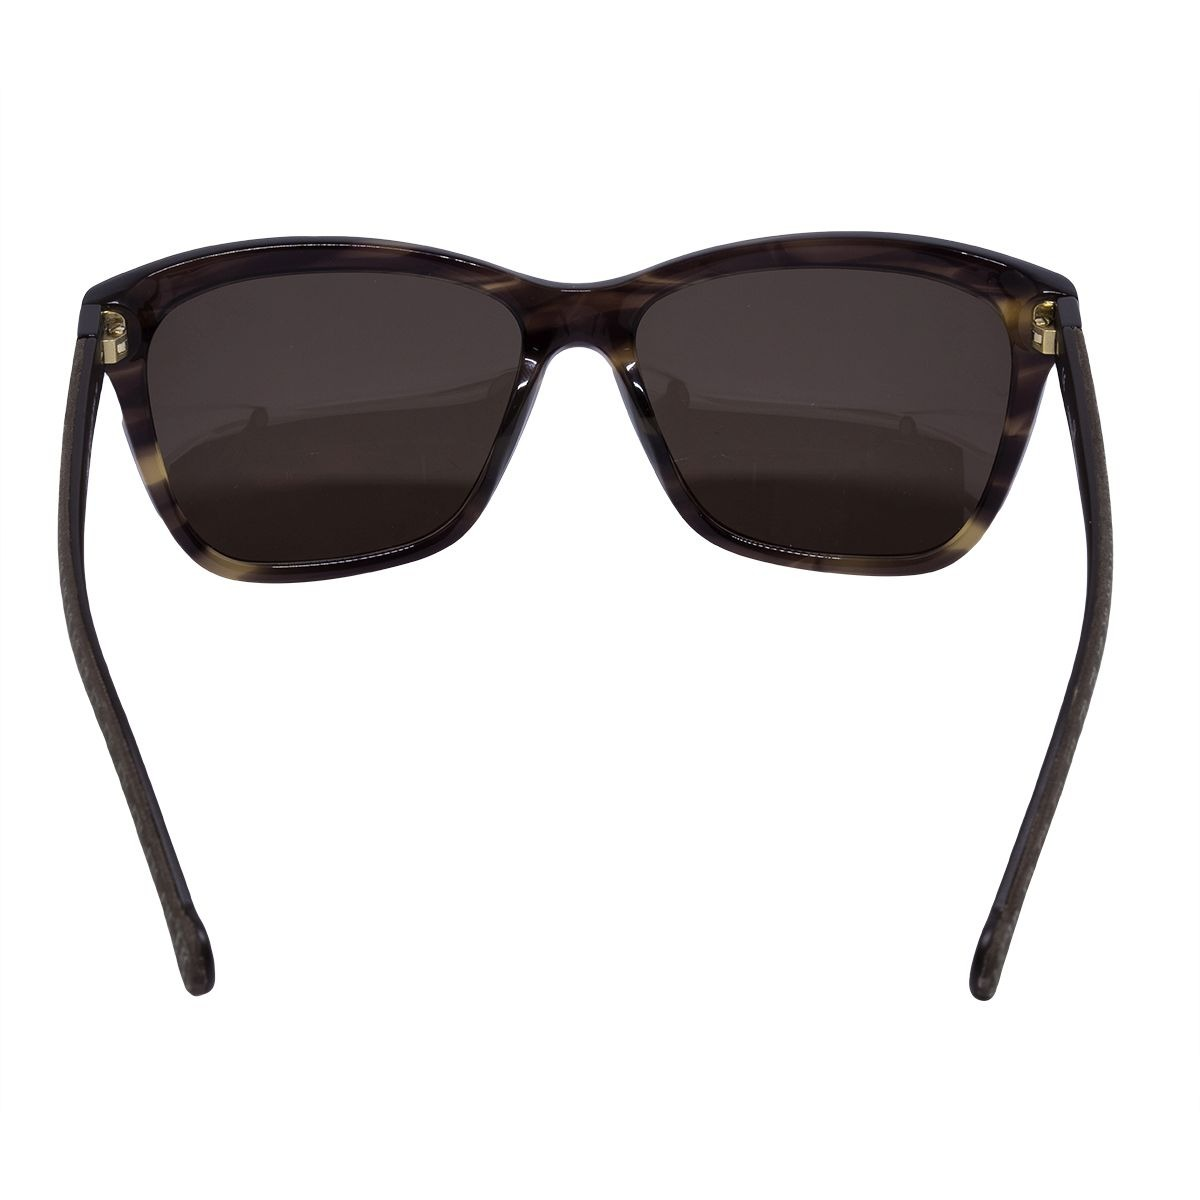 1d4d9a613021f óculos de sol carolina herrera original she701. Carregando zoom.